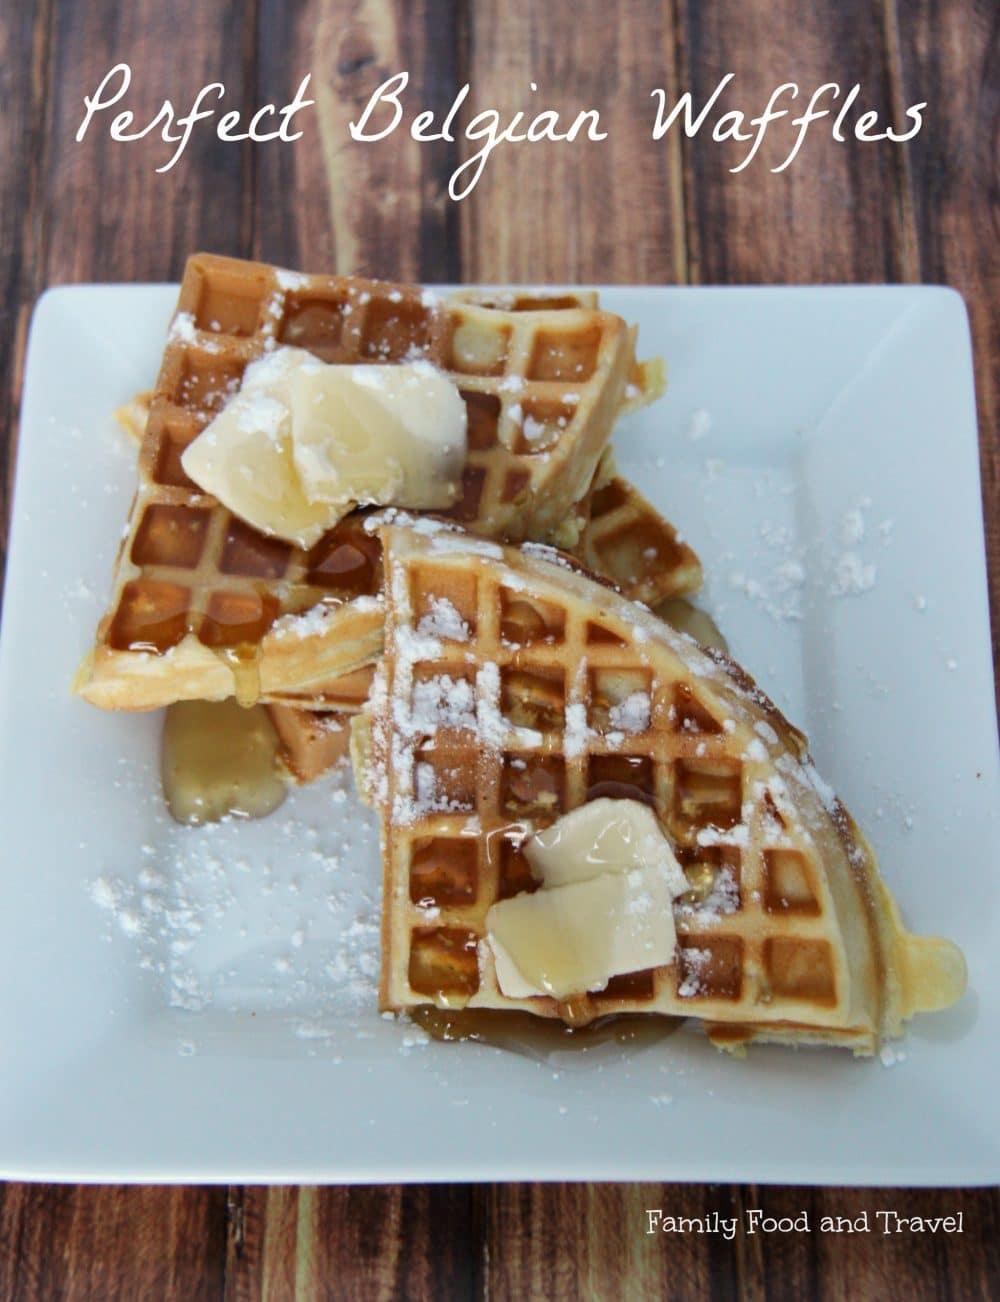 Perfect Belgian Waffles